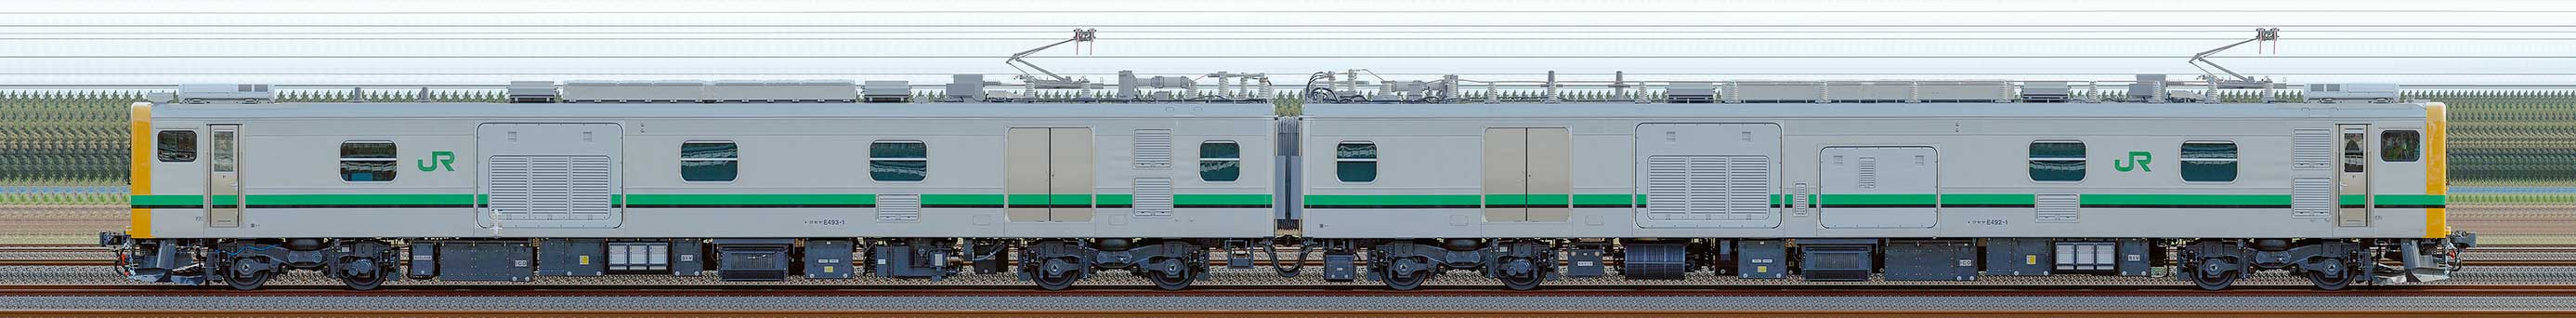 JR東日本E493系01編成(山側)の編成サイドビュー